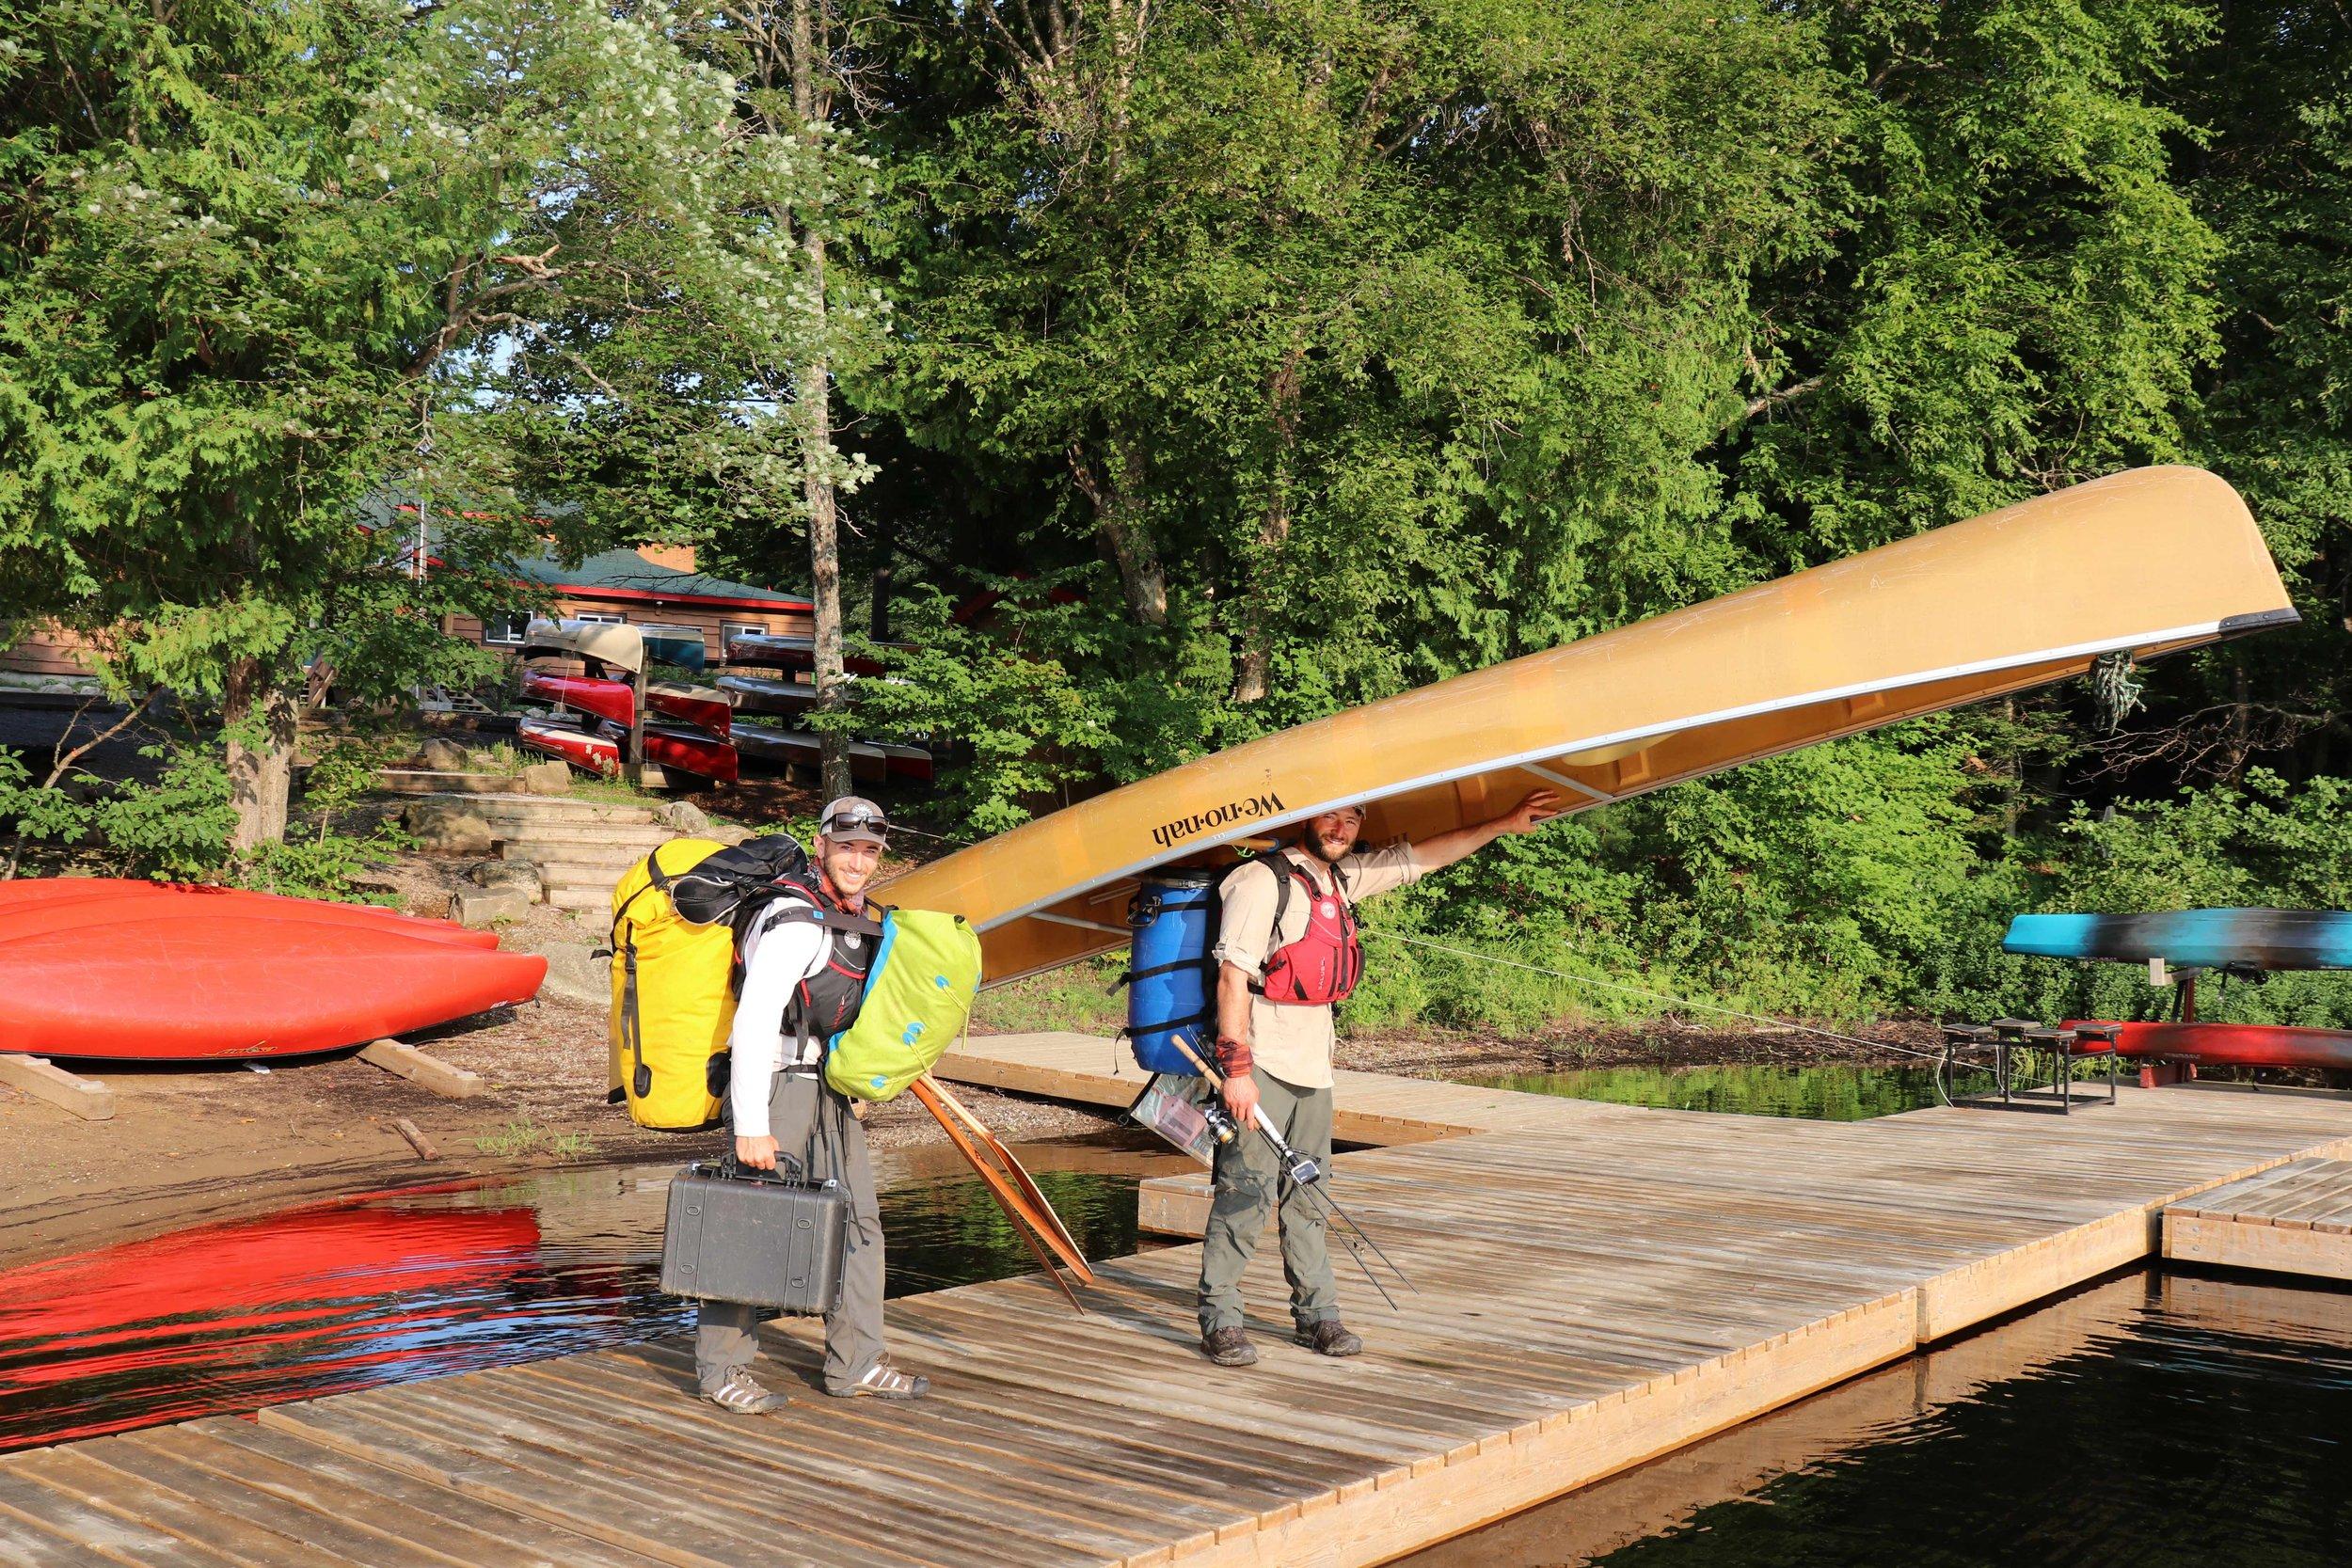 Trip Complete, The Meanest Link - Algonquin Park